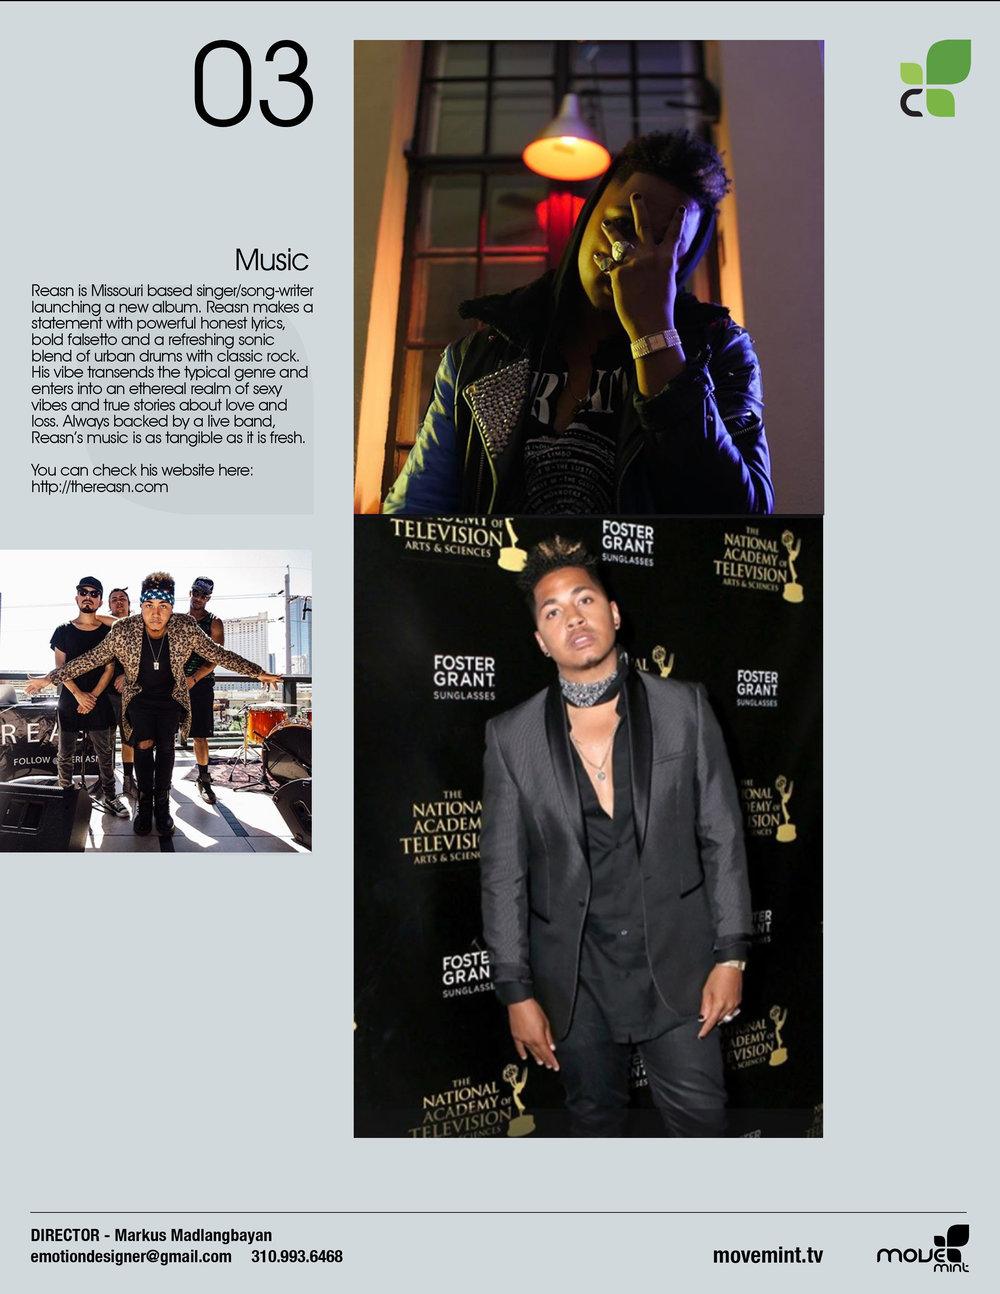 Reasn_Magic_Treatment_Page03_Music_v1.jpg